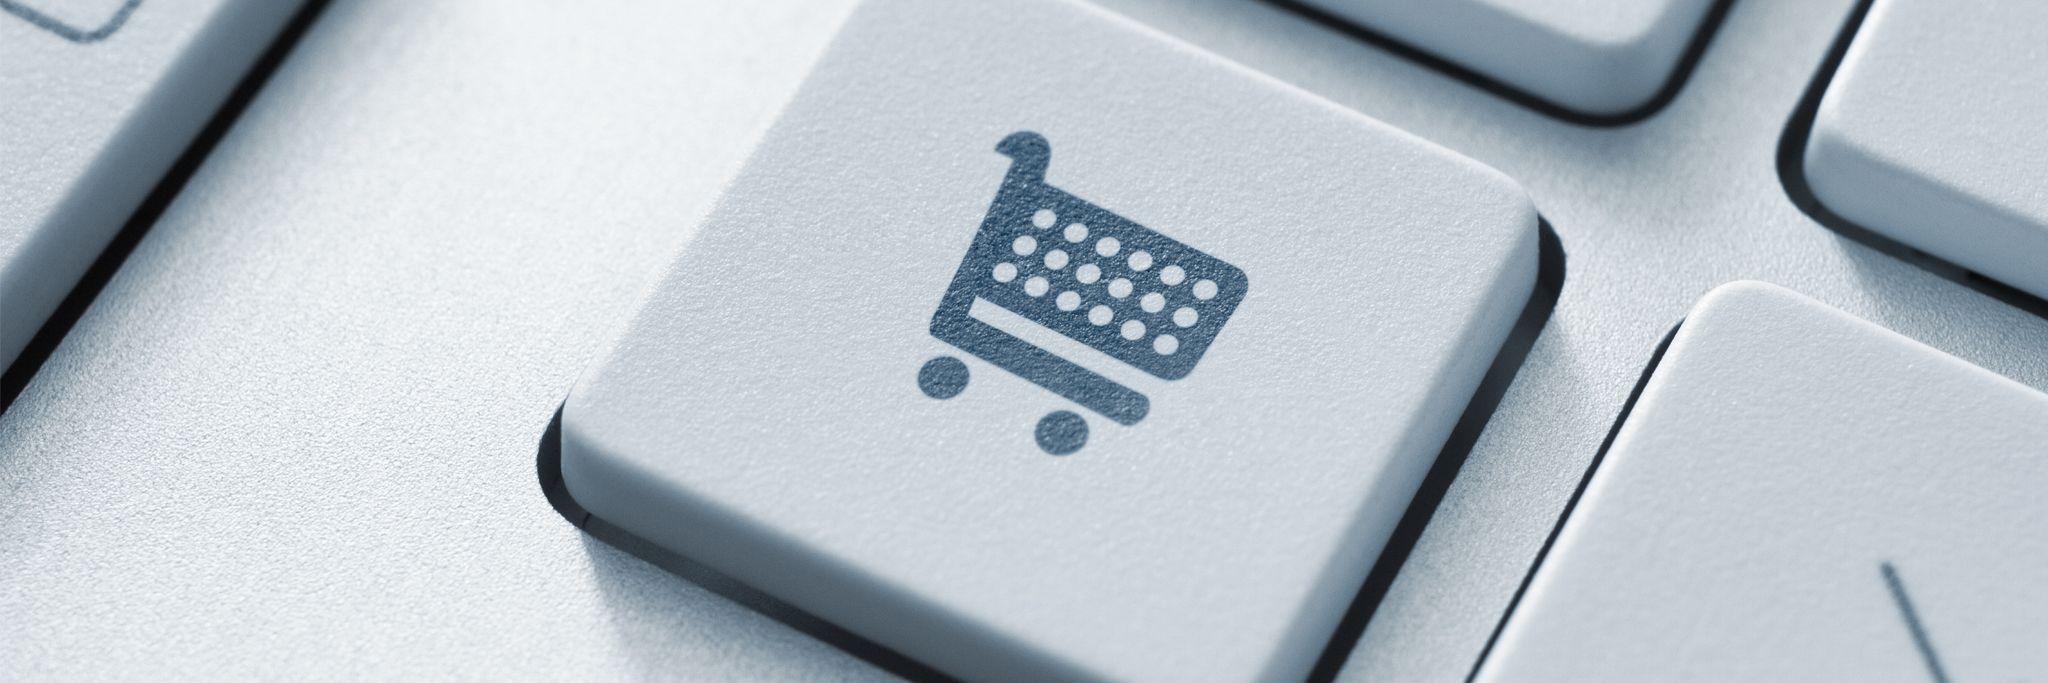 Genial How To Buy | Optical Communications | Corning